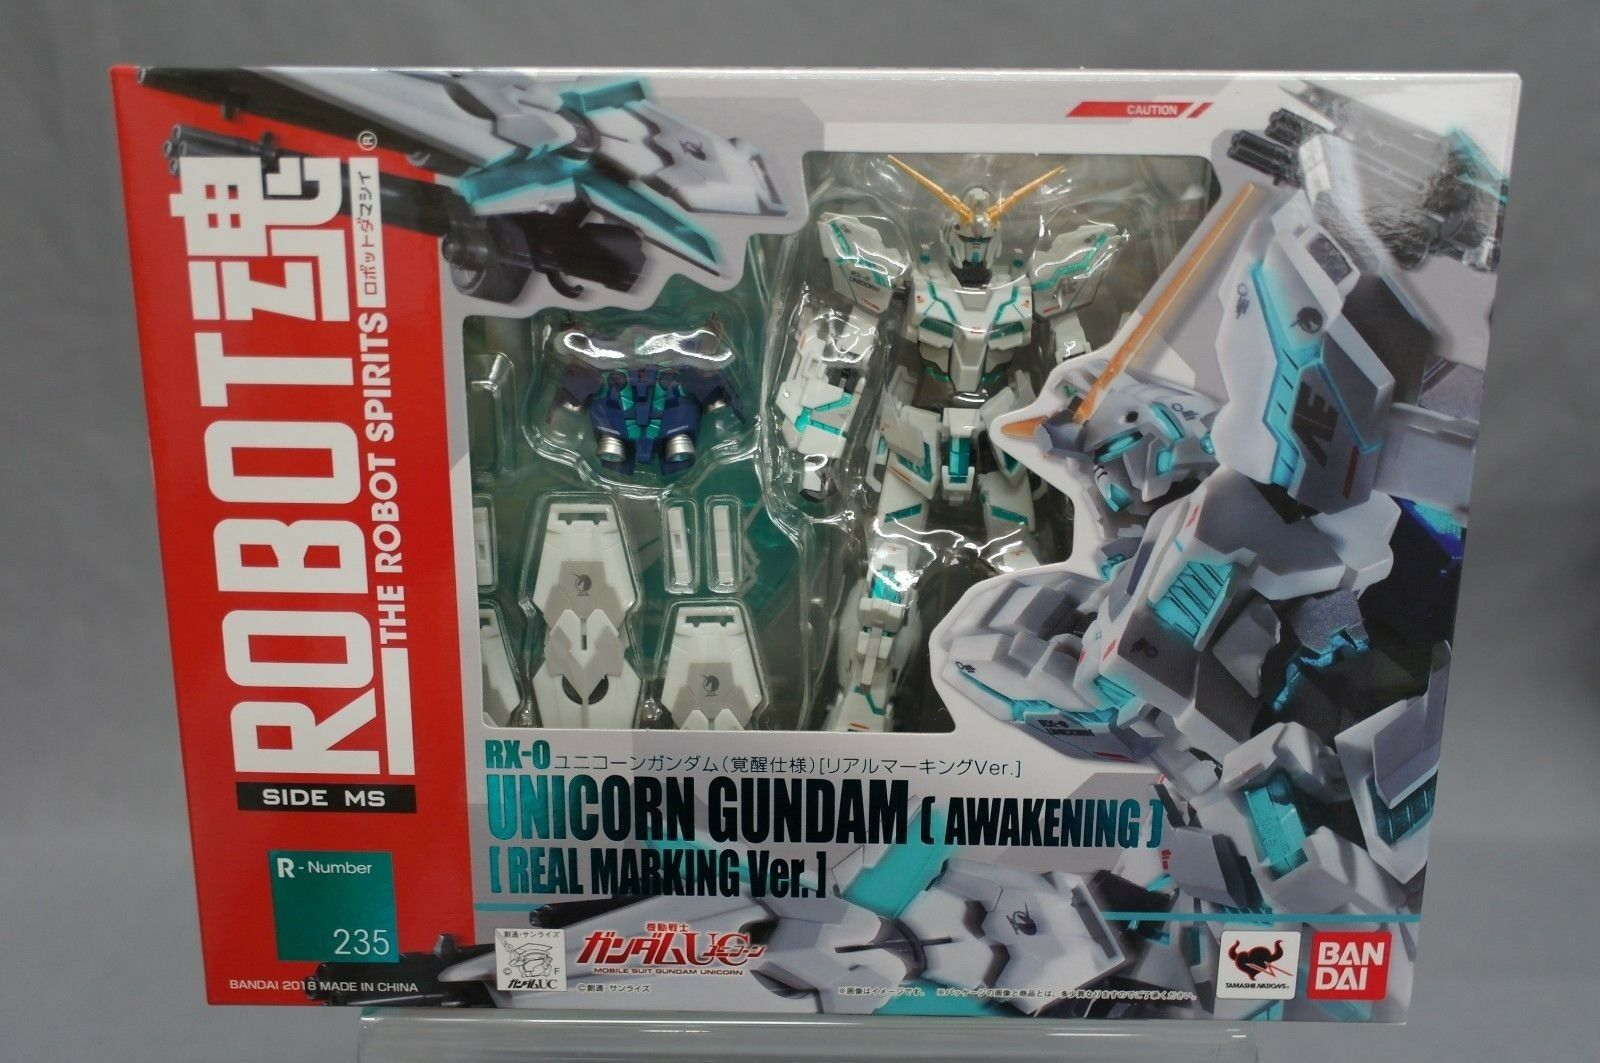 Robots Spirits Side MS 235 RX-0 Unicorn Gundam Awakening Real Marking Bandai USE